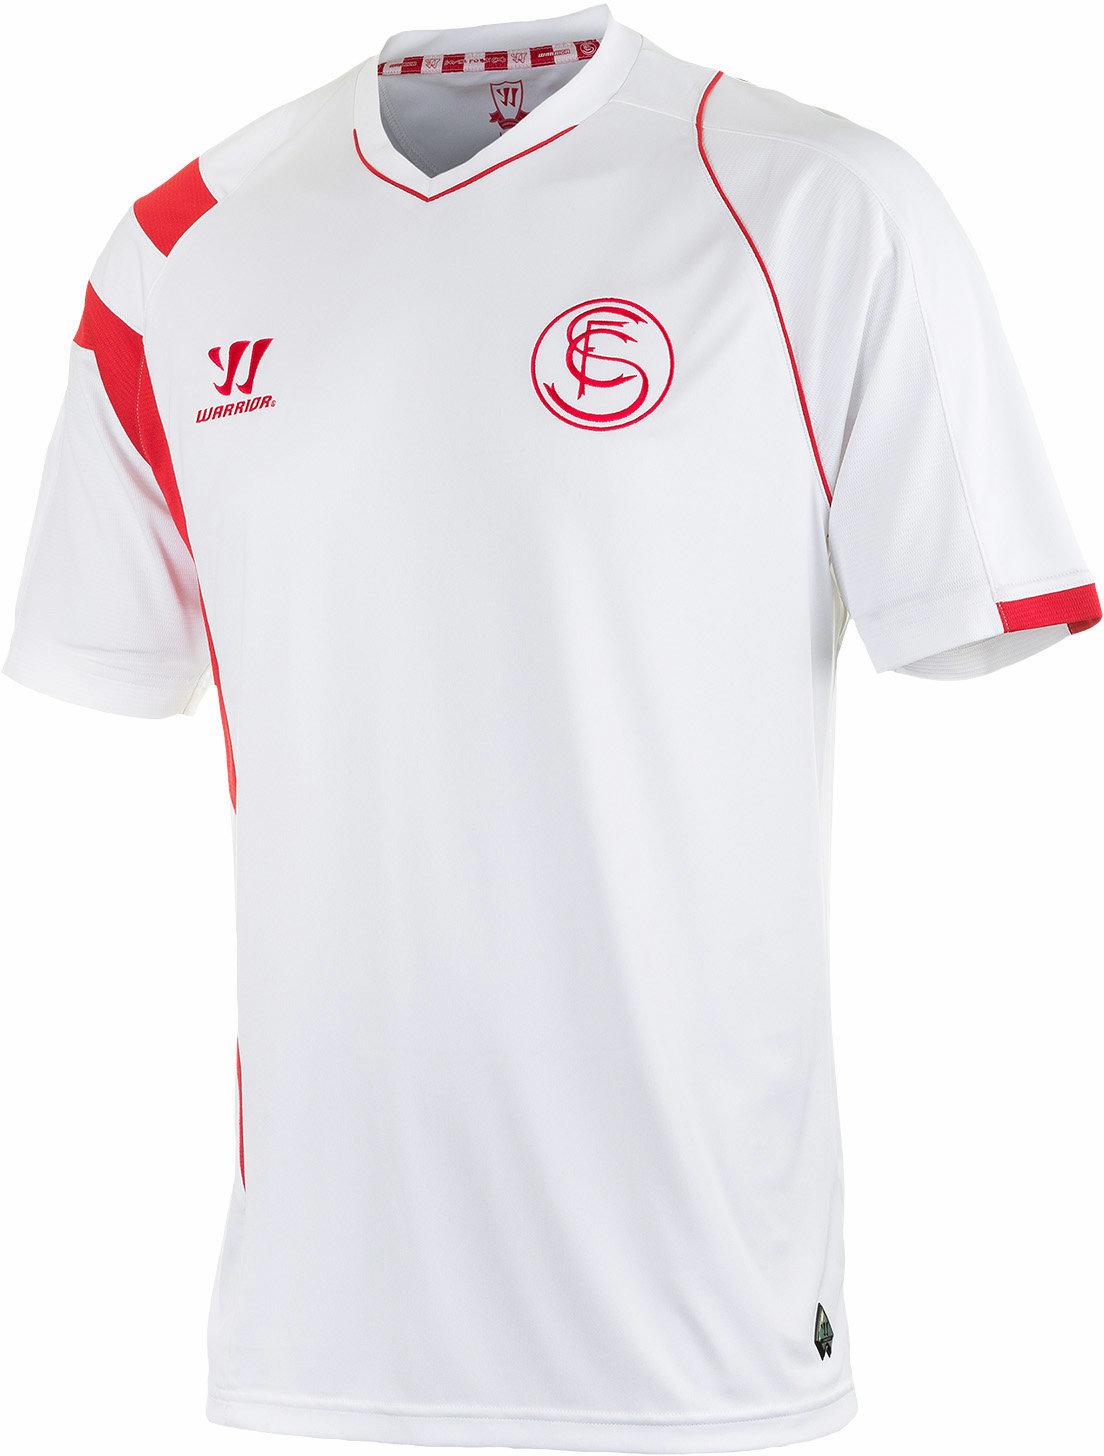 New Warrior Sevilla 14-15 Home, Away And Third Kits